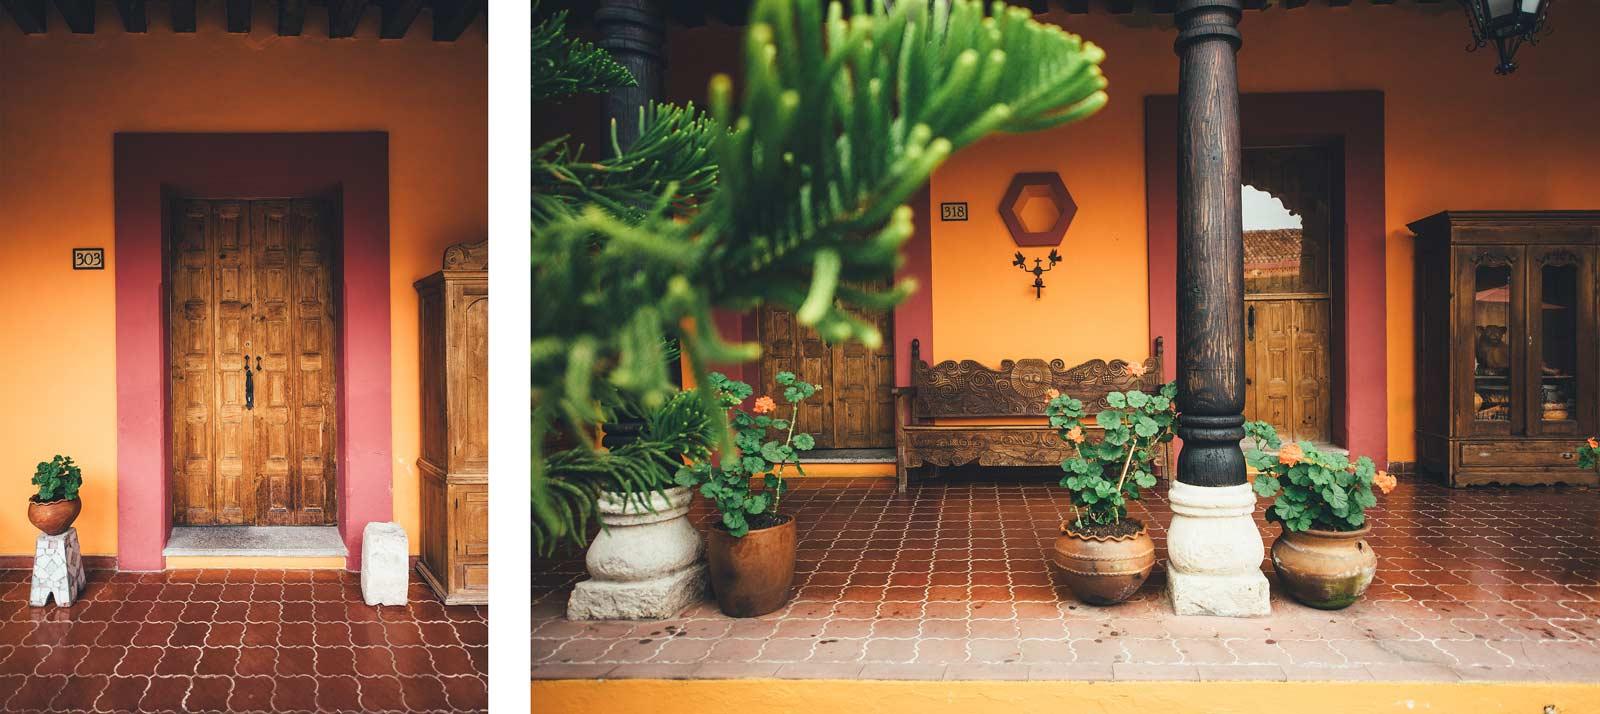 Hotel Diego de Mazariegos, San Cristobal, Chiapas